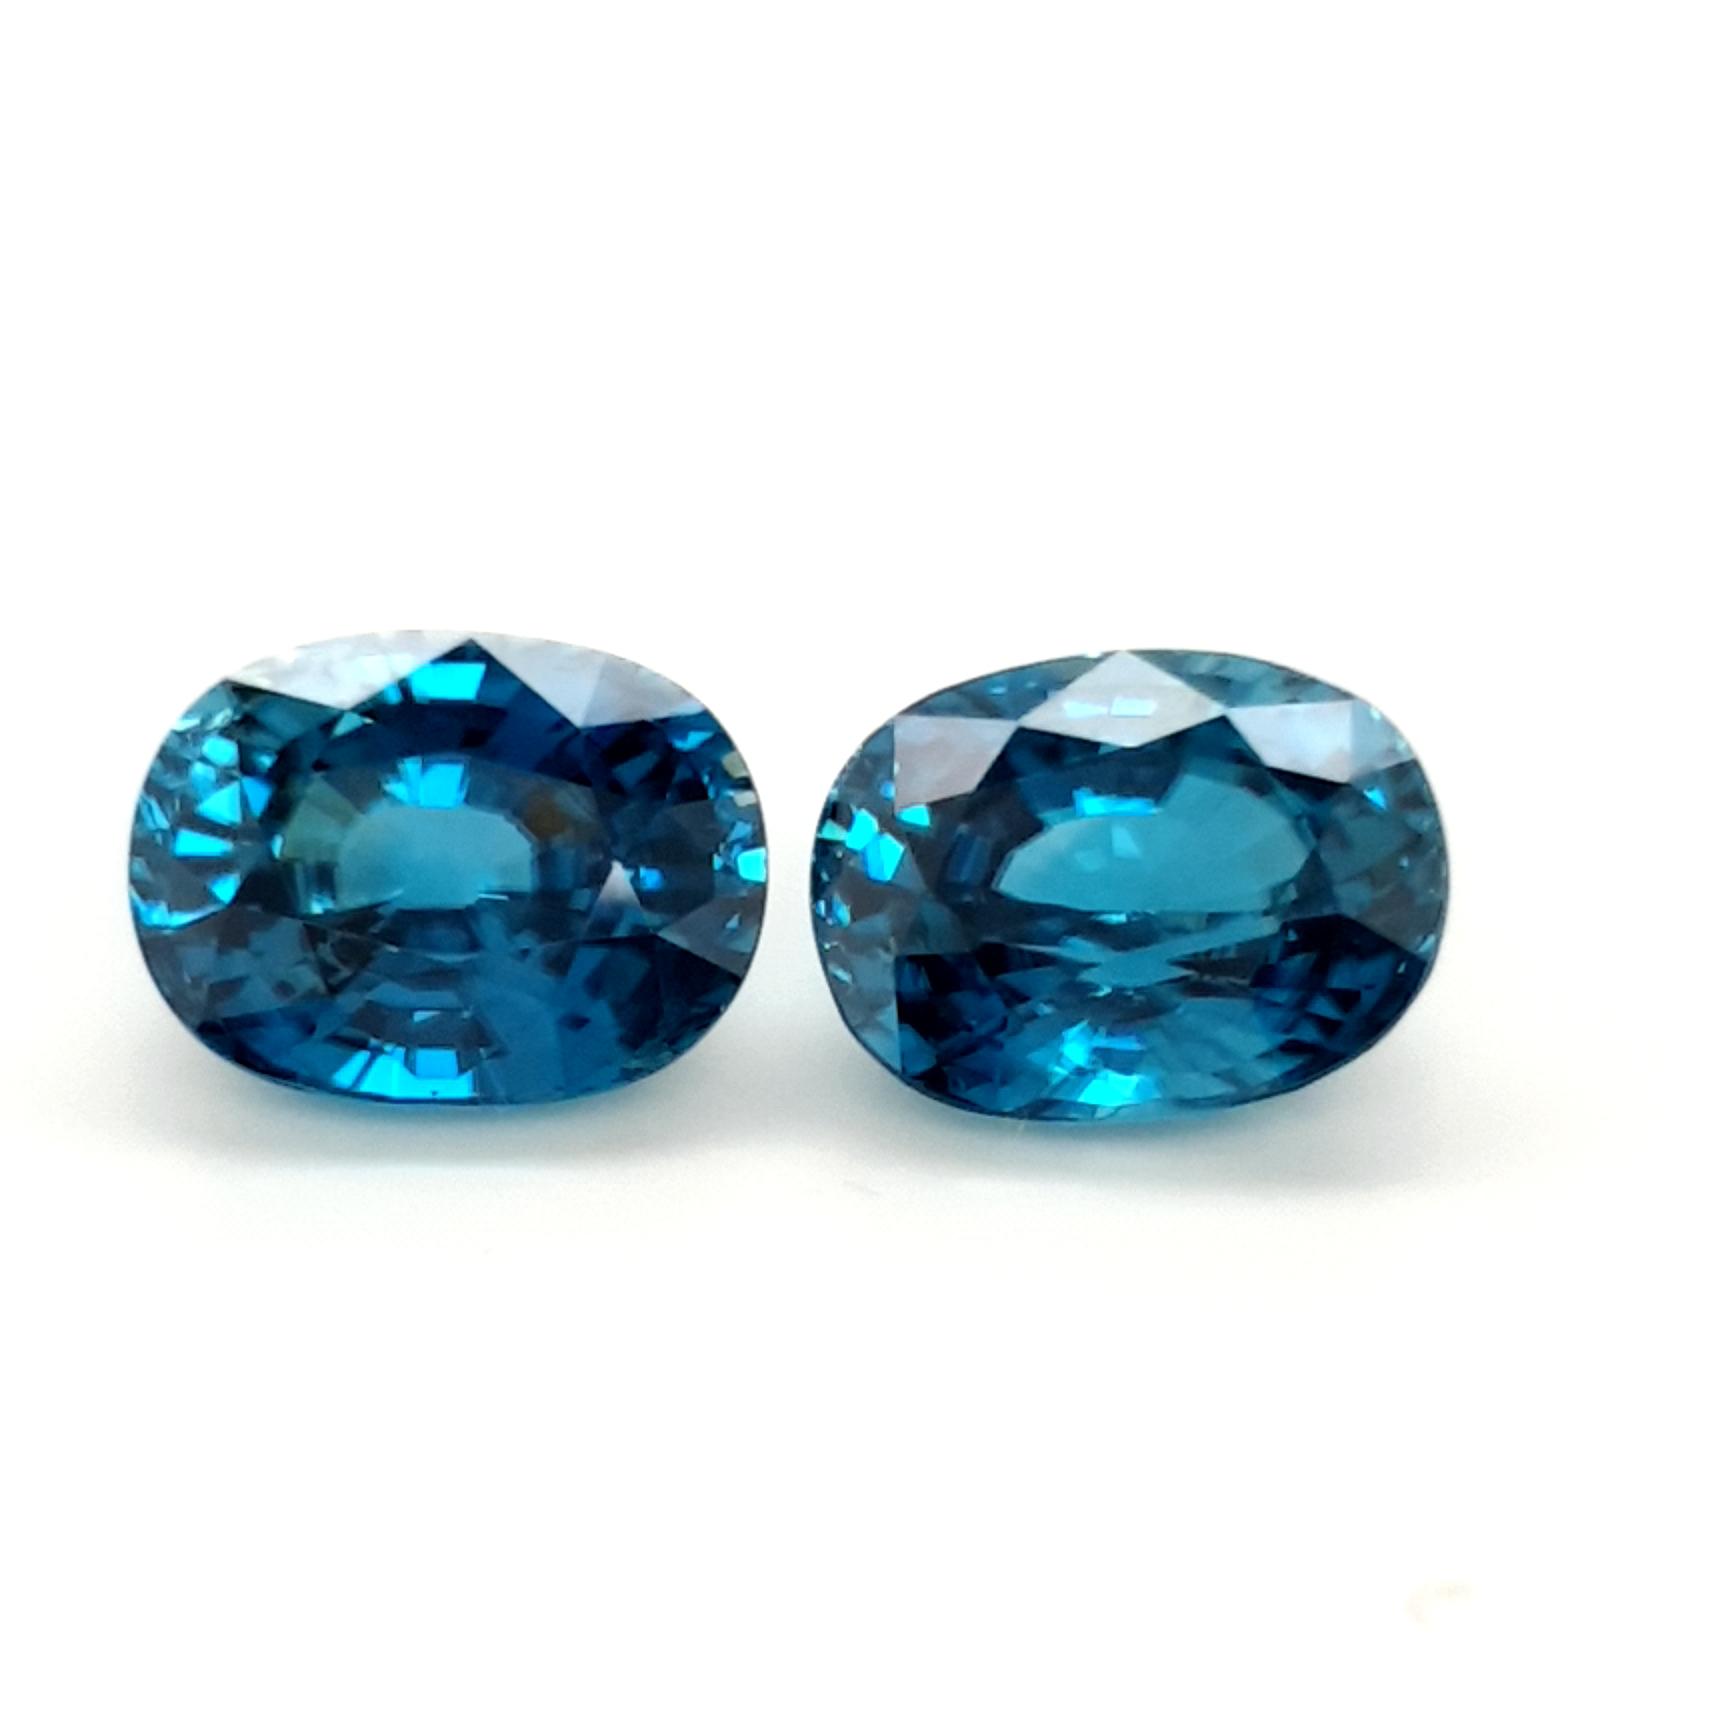 36,53ct.Pair Starlight blue Zircon from Cambodia ZCK16D9 ClaudiaHamann__2021-04-12-18-24-32